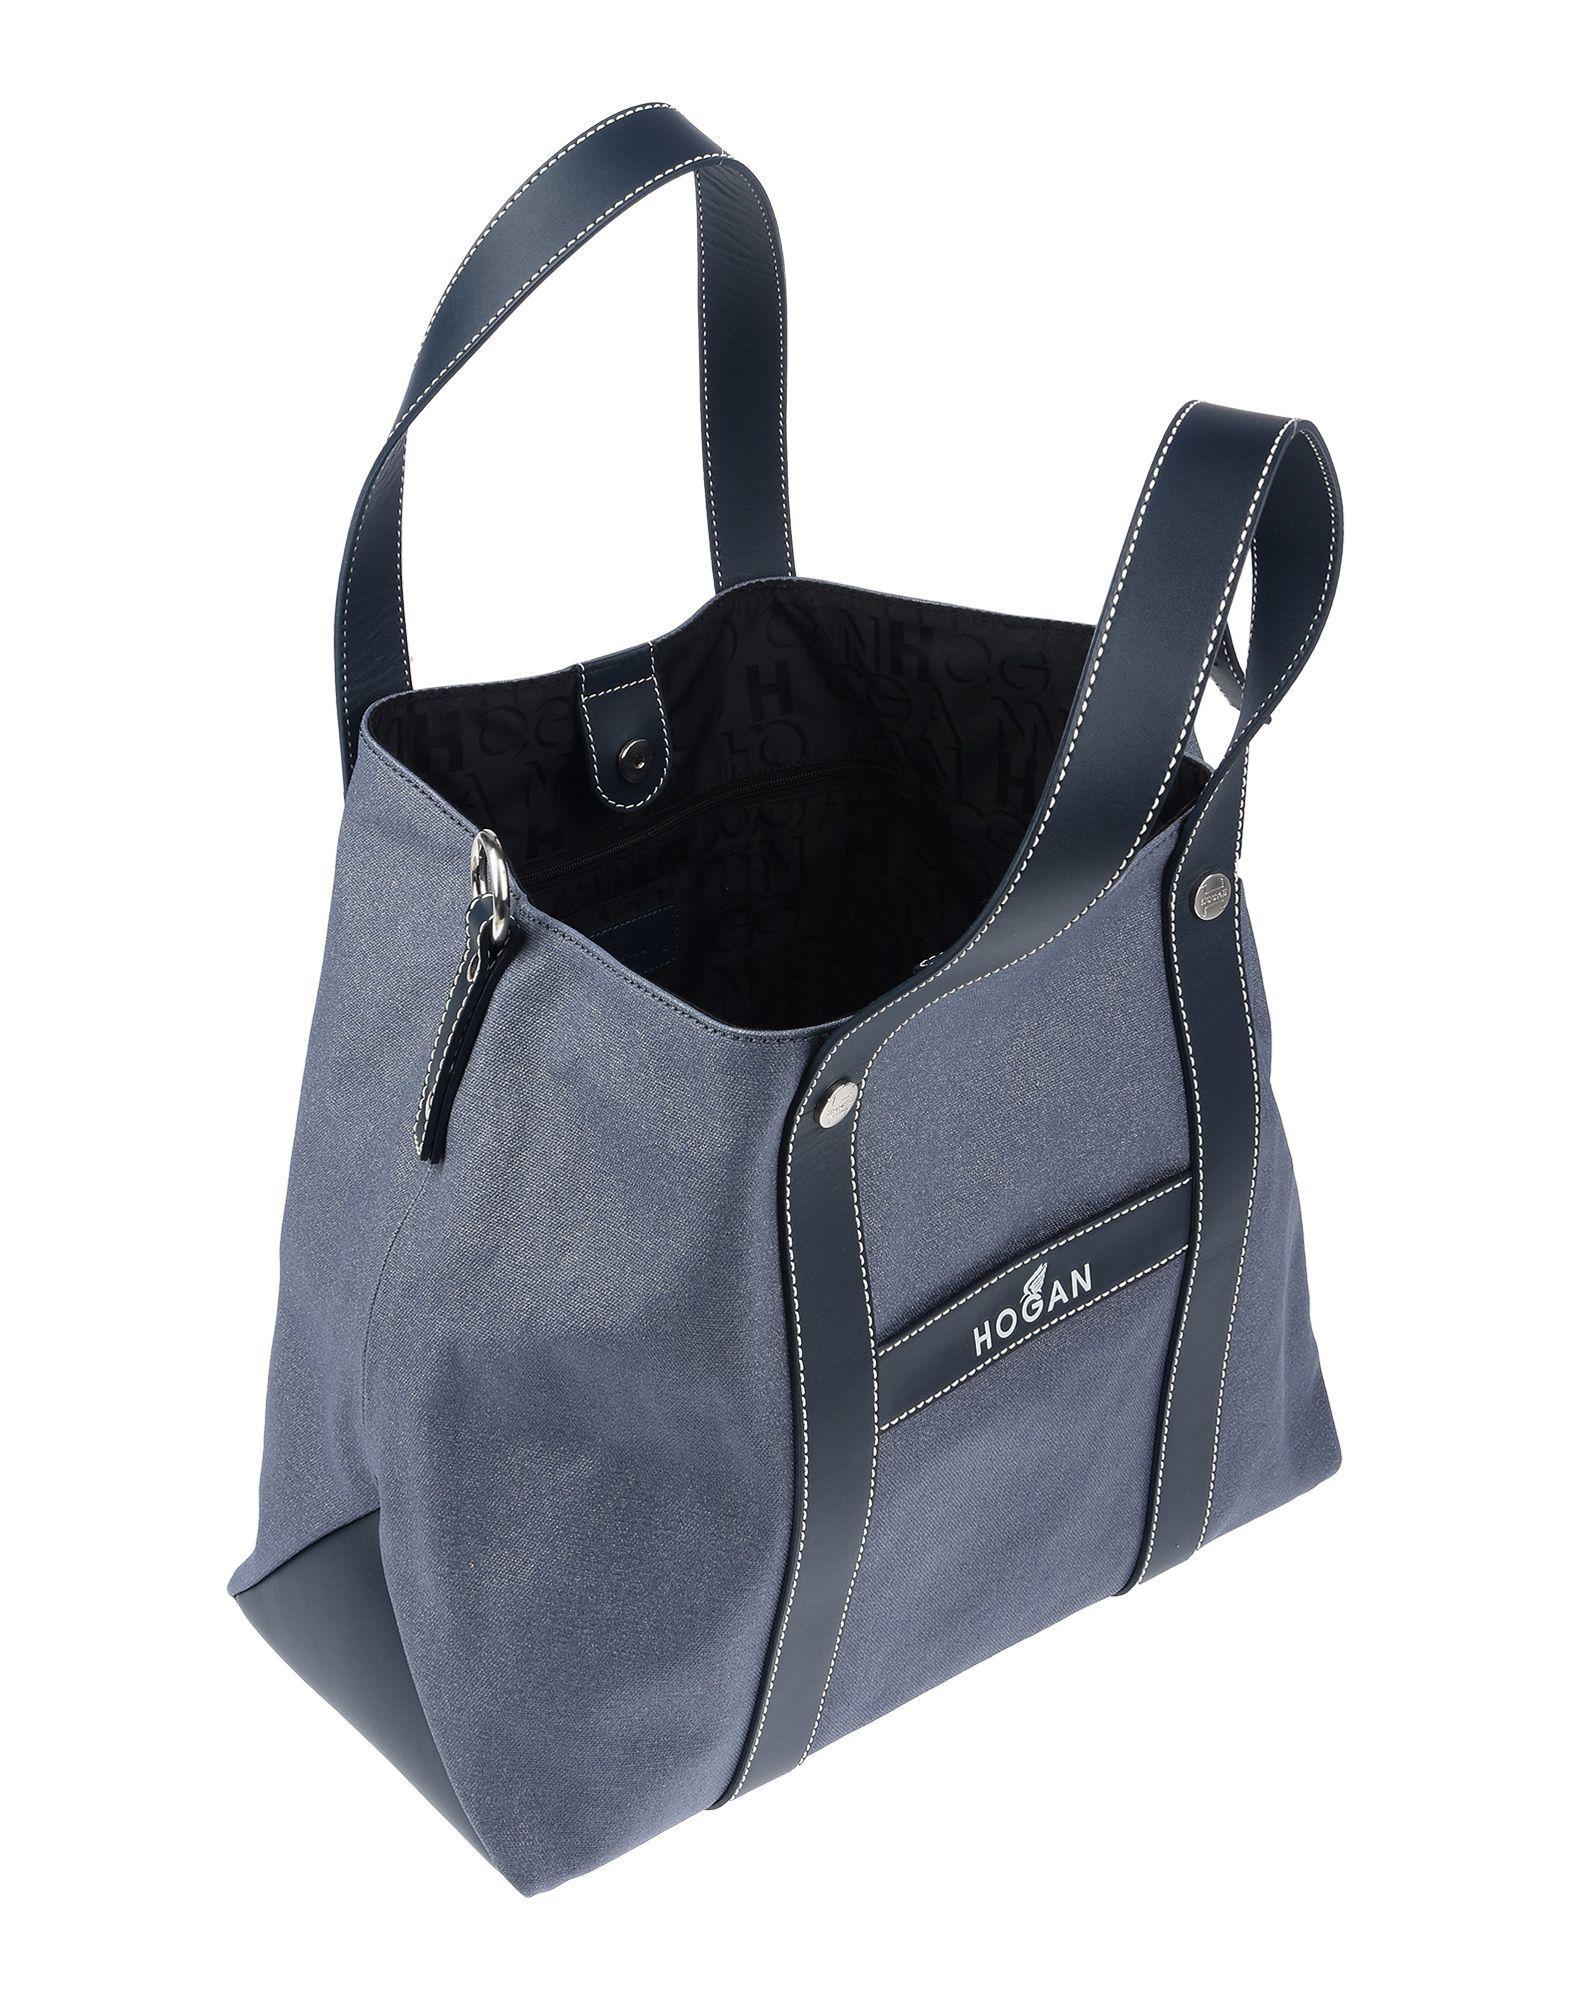 6a855979f4 Lyst - Hogan Handbag in Blue